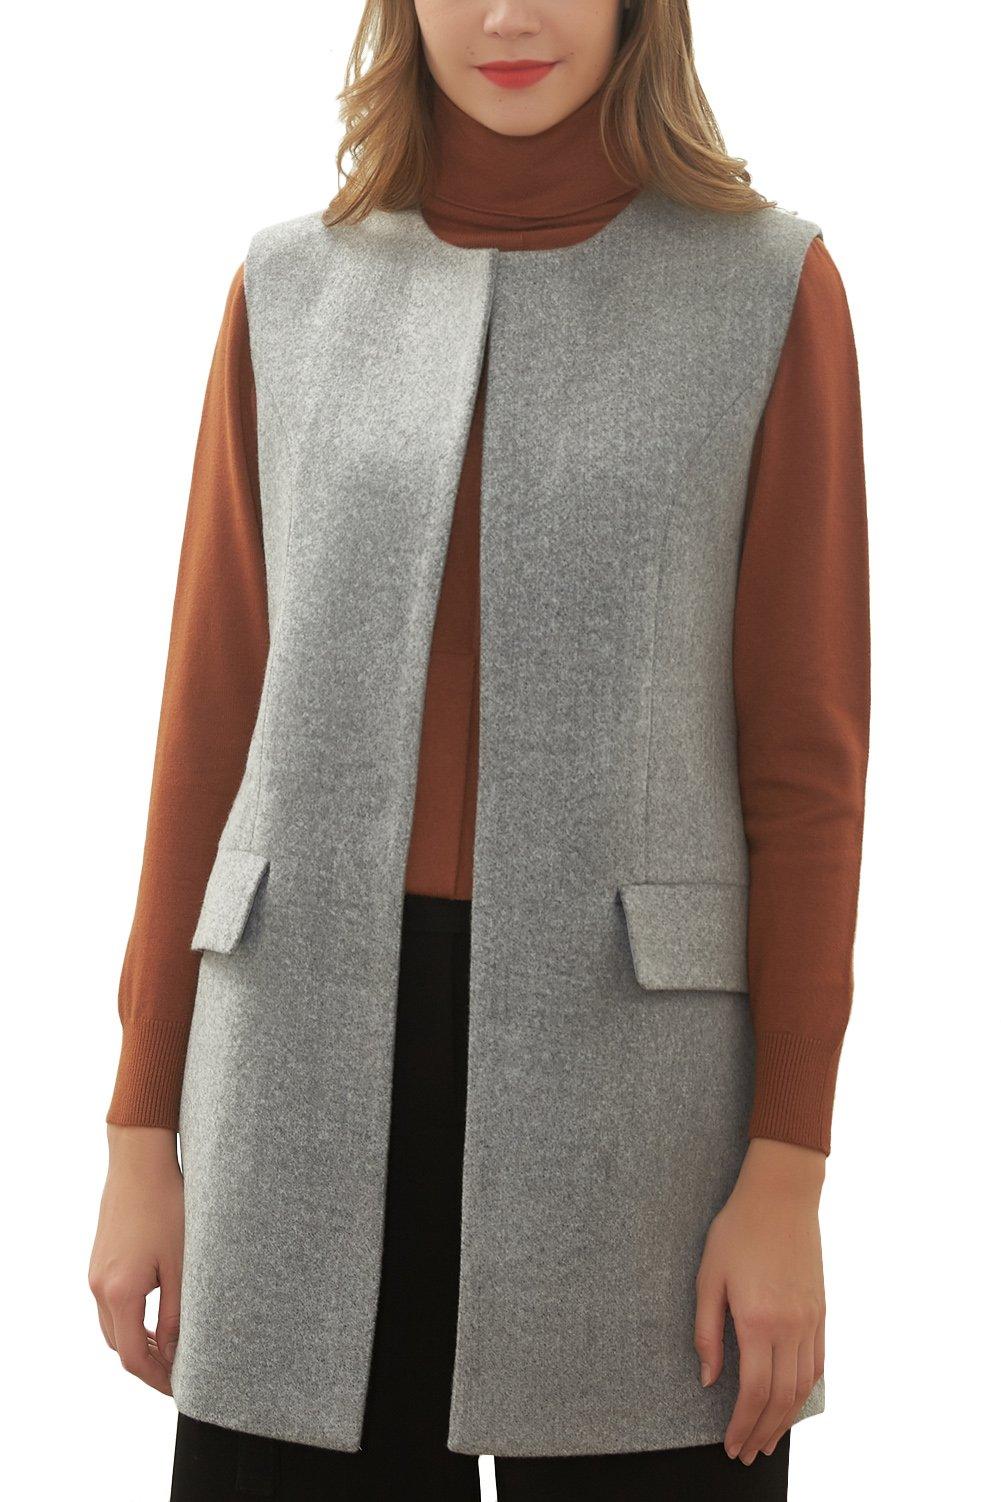 Hanayome Women's Jacket Cardigan Round Collar Slim Fit Long Wool Outwear Coat MI6 (Grey, 16W)